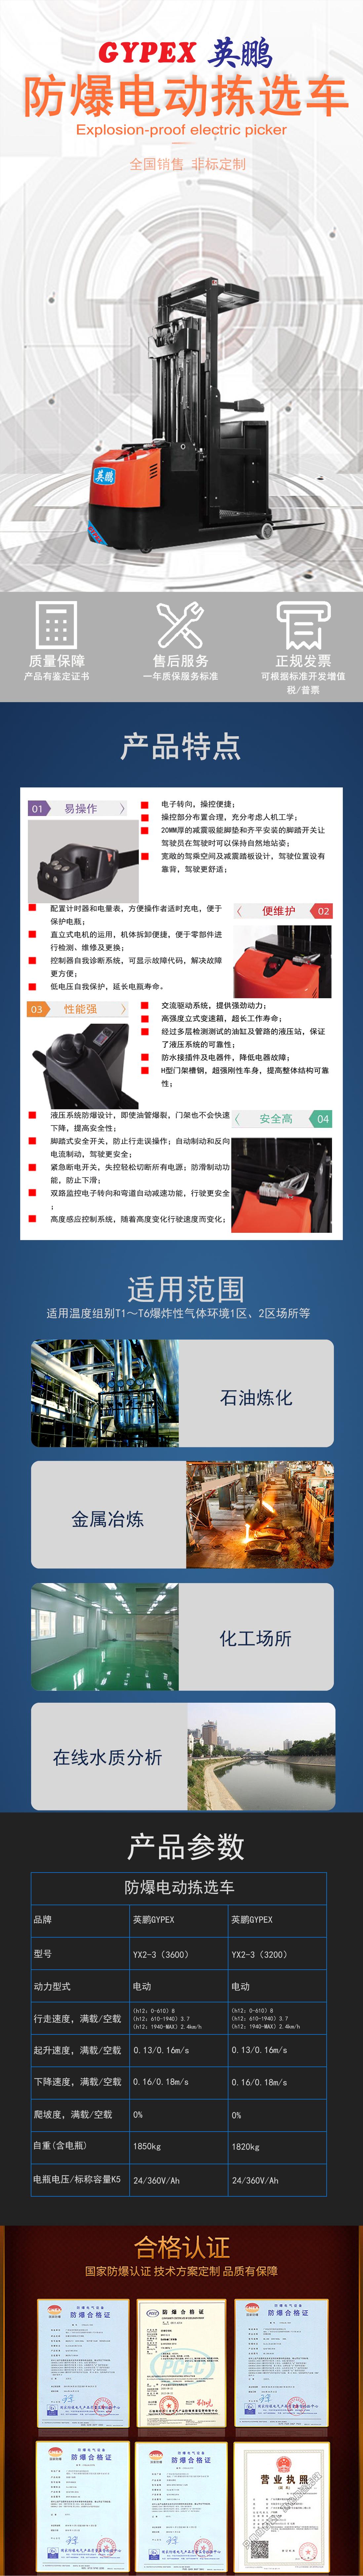 YX2-3(3600)(3200)防爆電動揀選車詳情圖.jpg